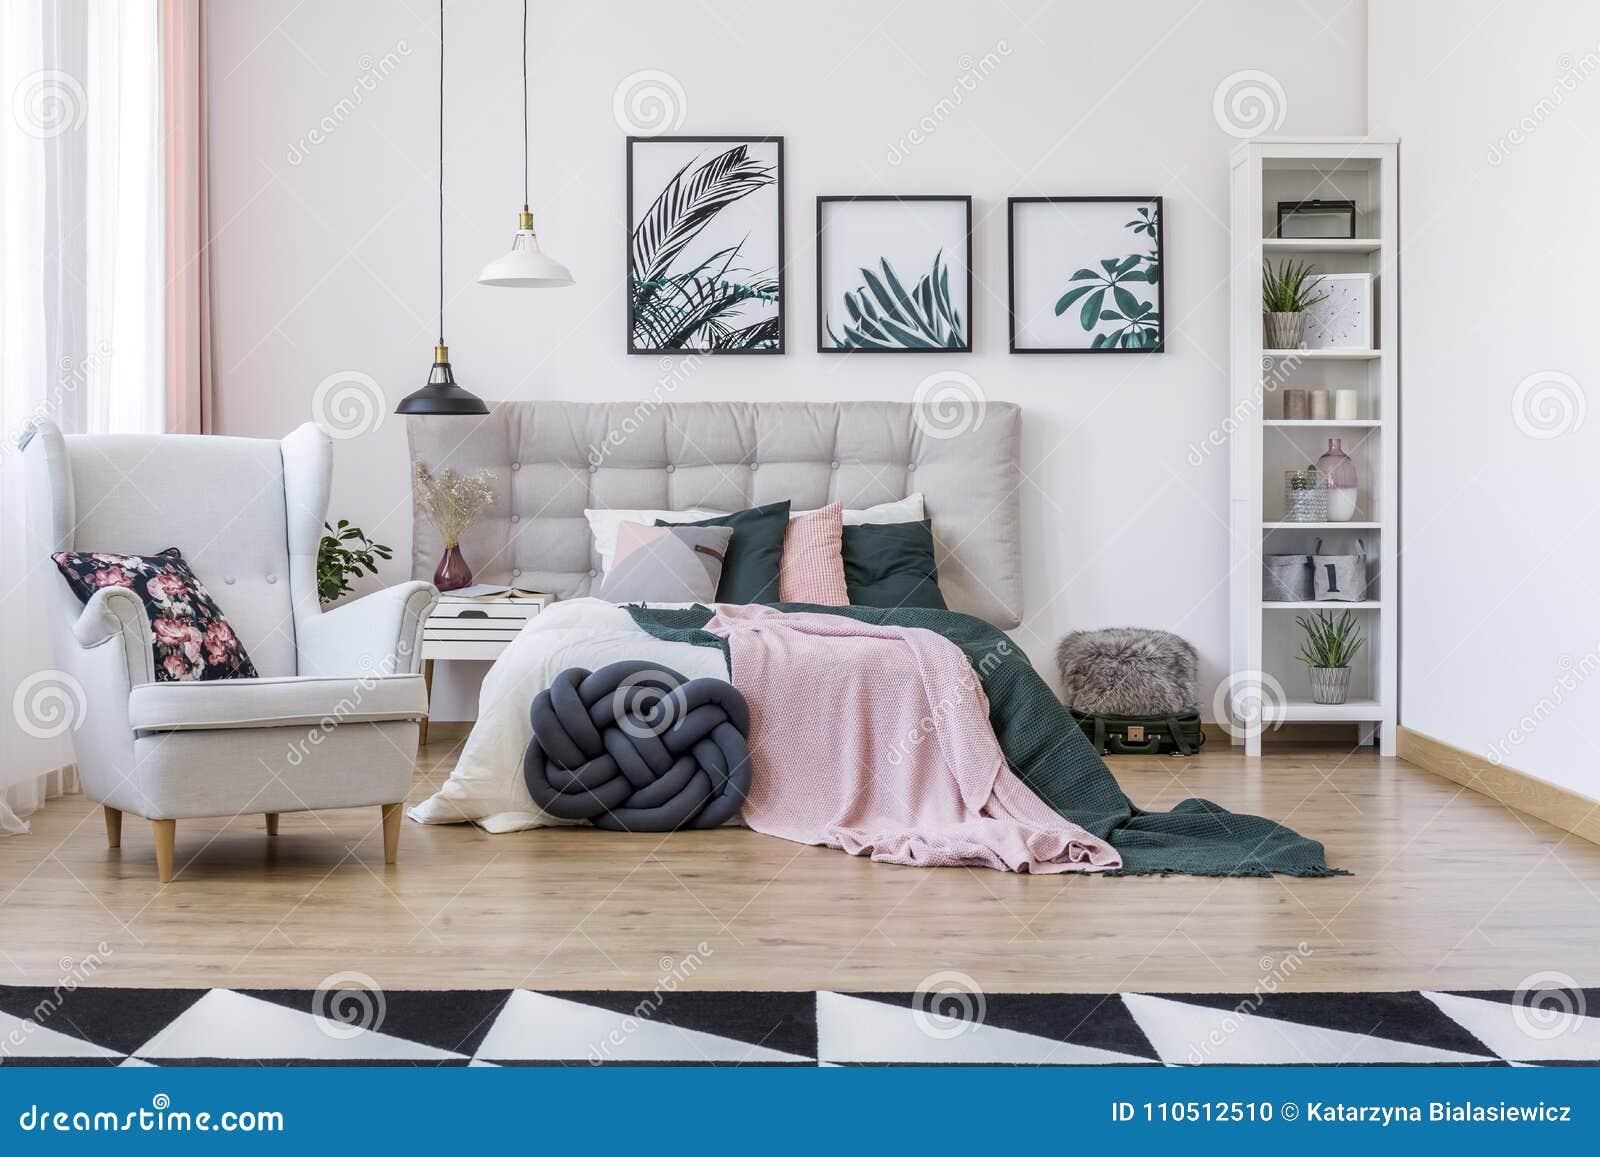 grey armchair bedroom interior knot pillow near bed pink green bedding near grey armchair bedroom interior